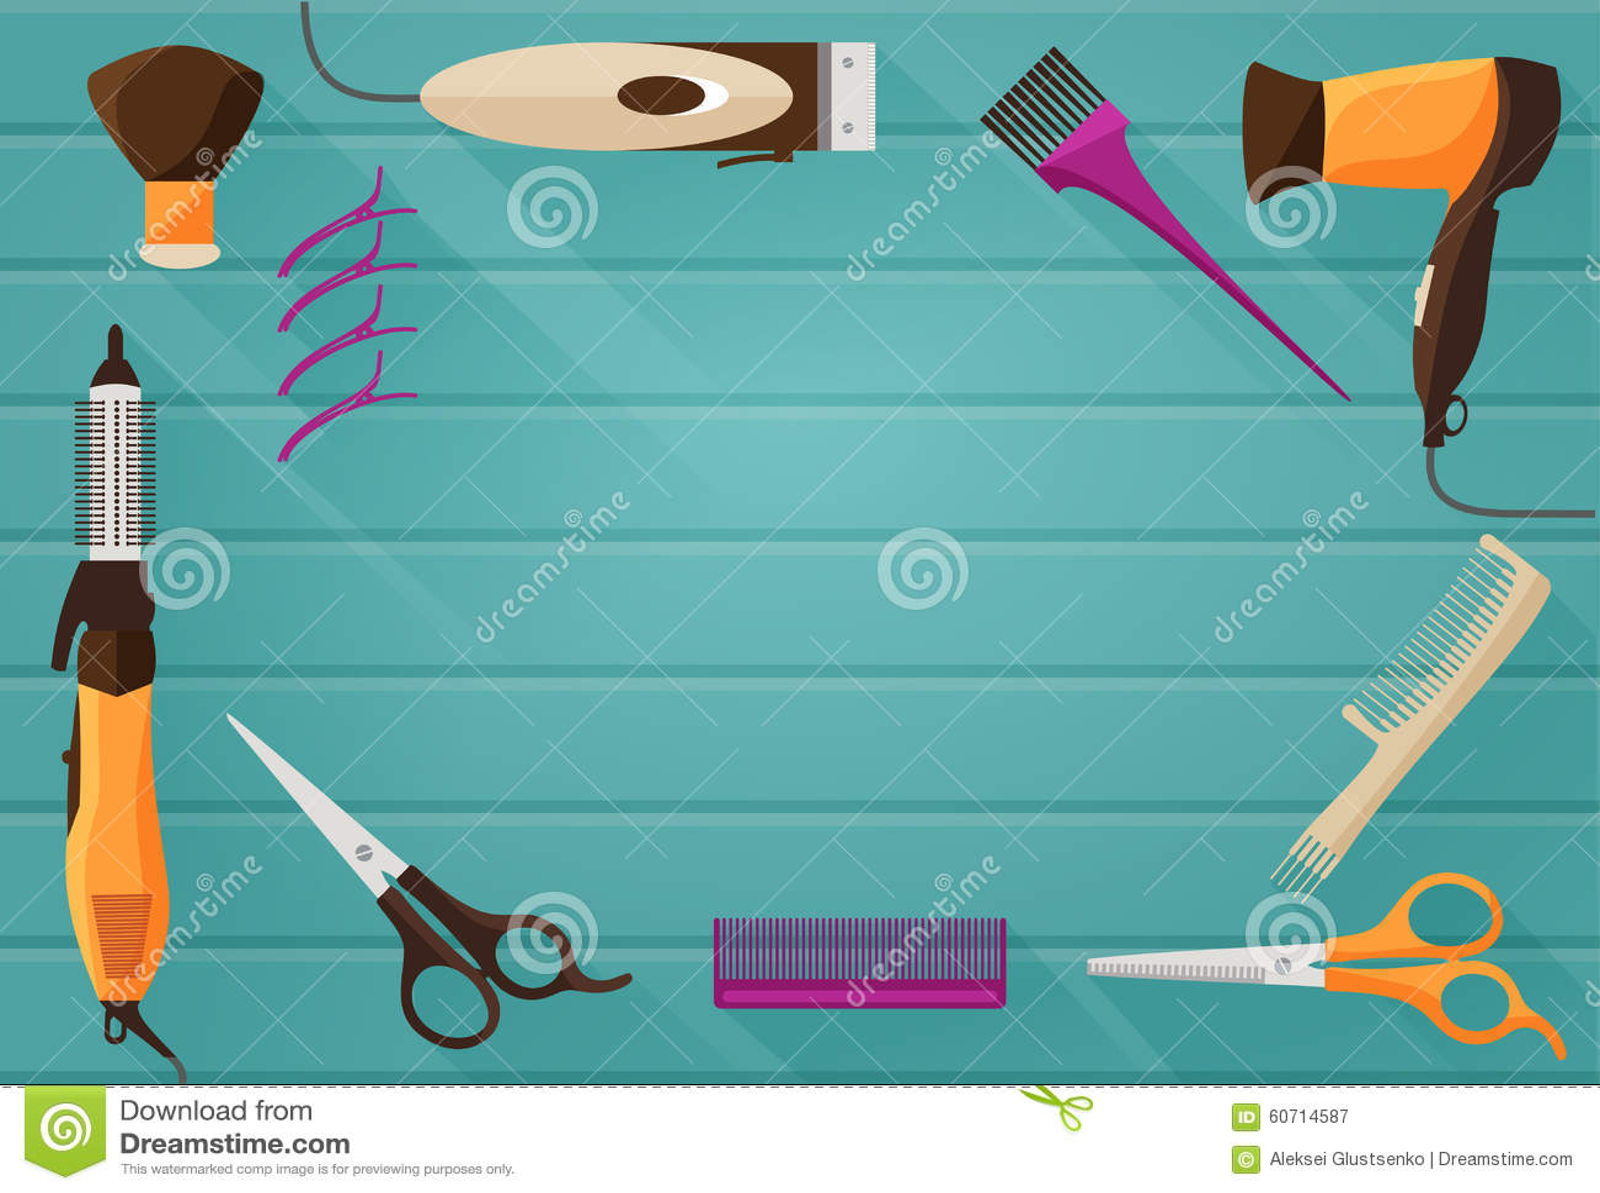 Hairdressing Salon Barbershop Tools Flat Background Stock